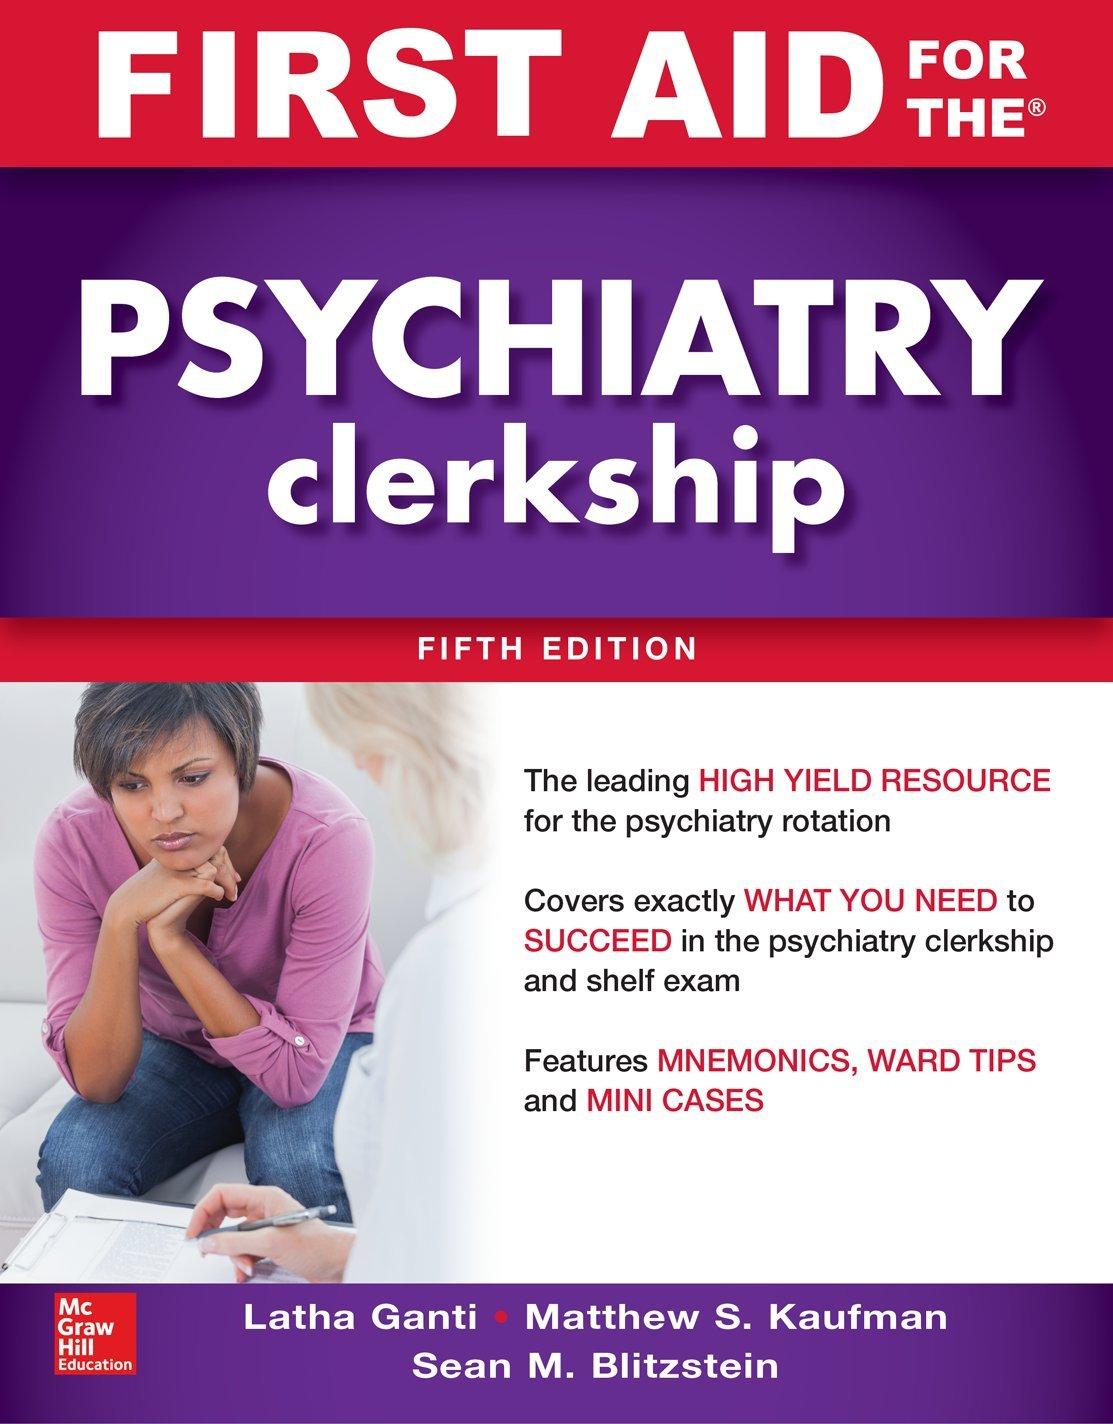 First Aid for the Psychiatry Clerkship, Fifth Edition: Latha Ganti, Matthew  S. Kaufman, Sean M. Blitzstein: 9781260143393: Books - Amazon.ca